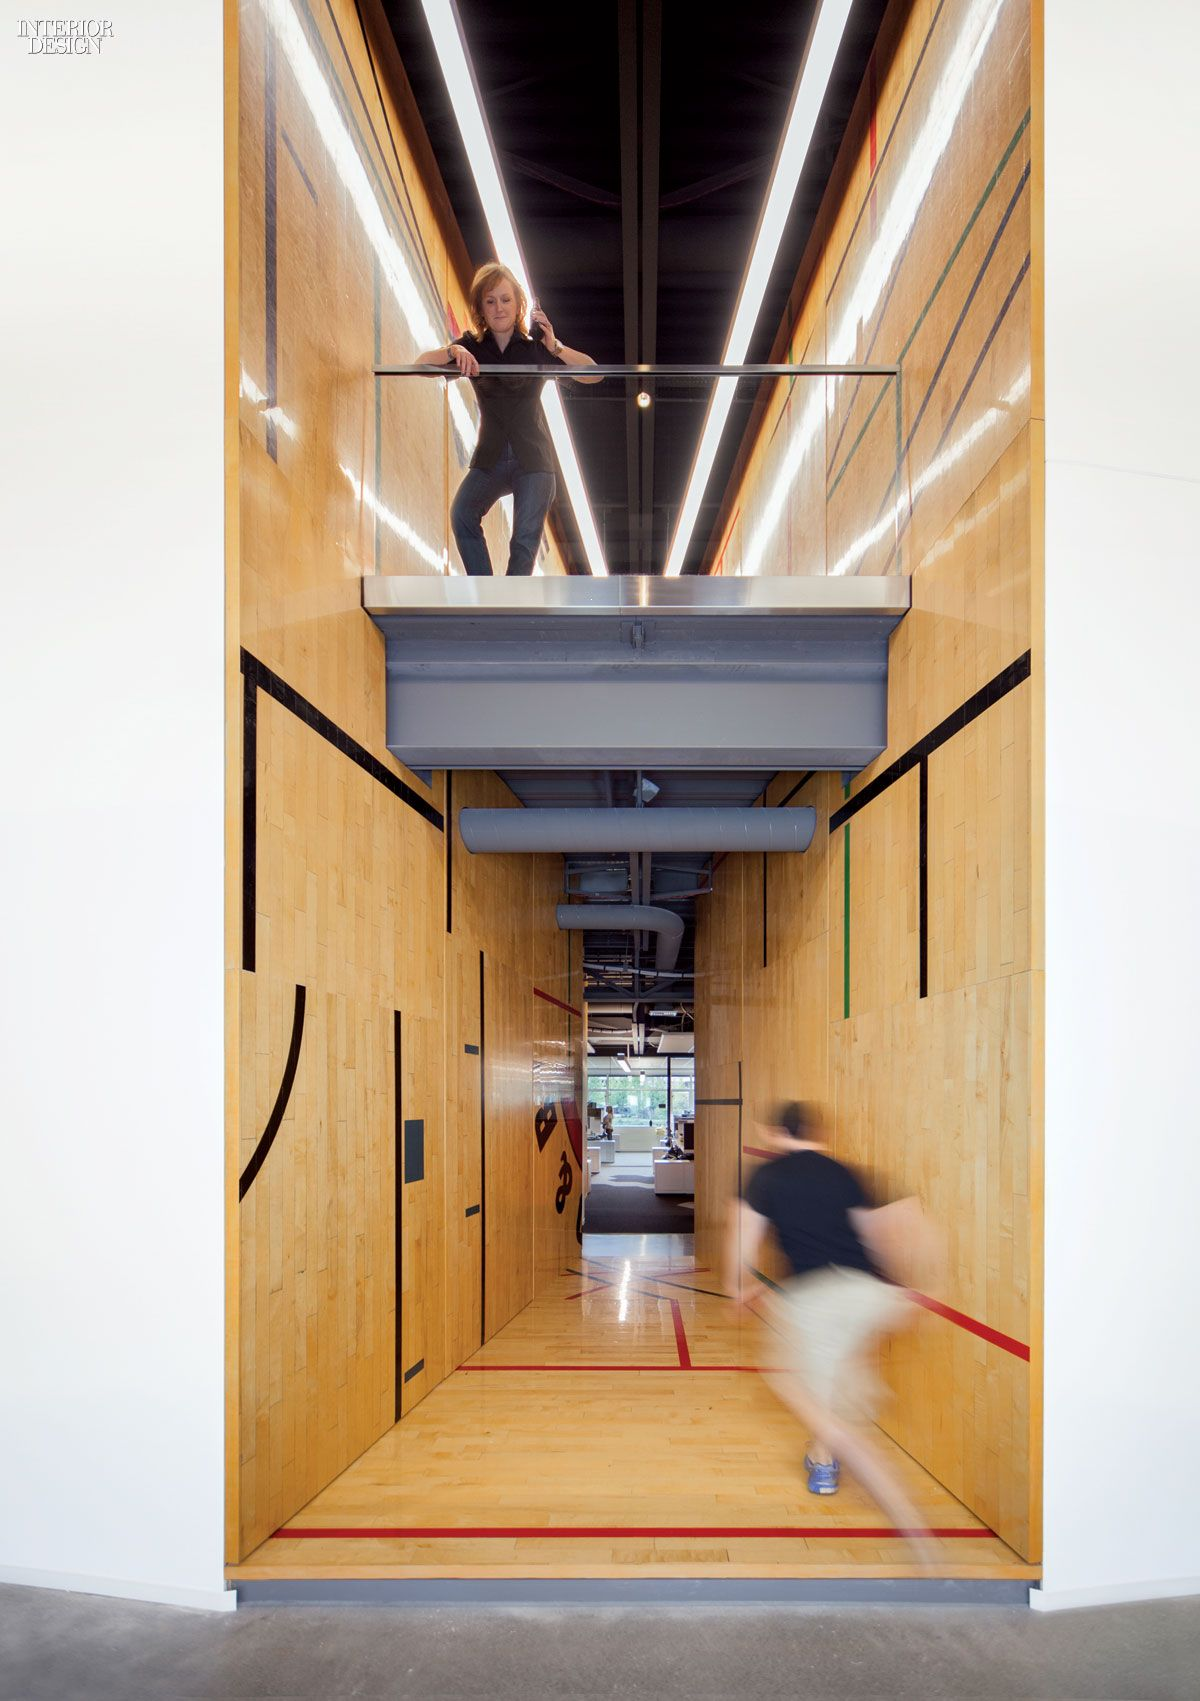 Gensler Adapts Former Gym For Tableau Software Offices